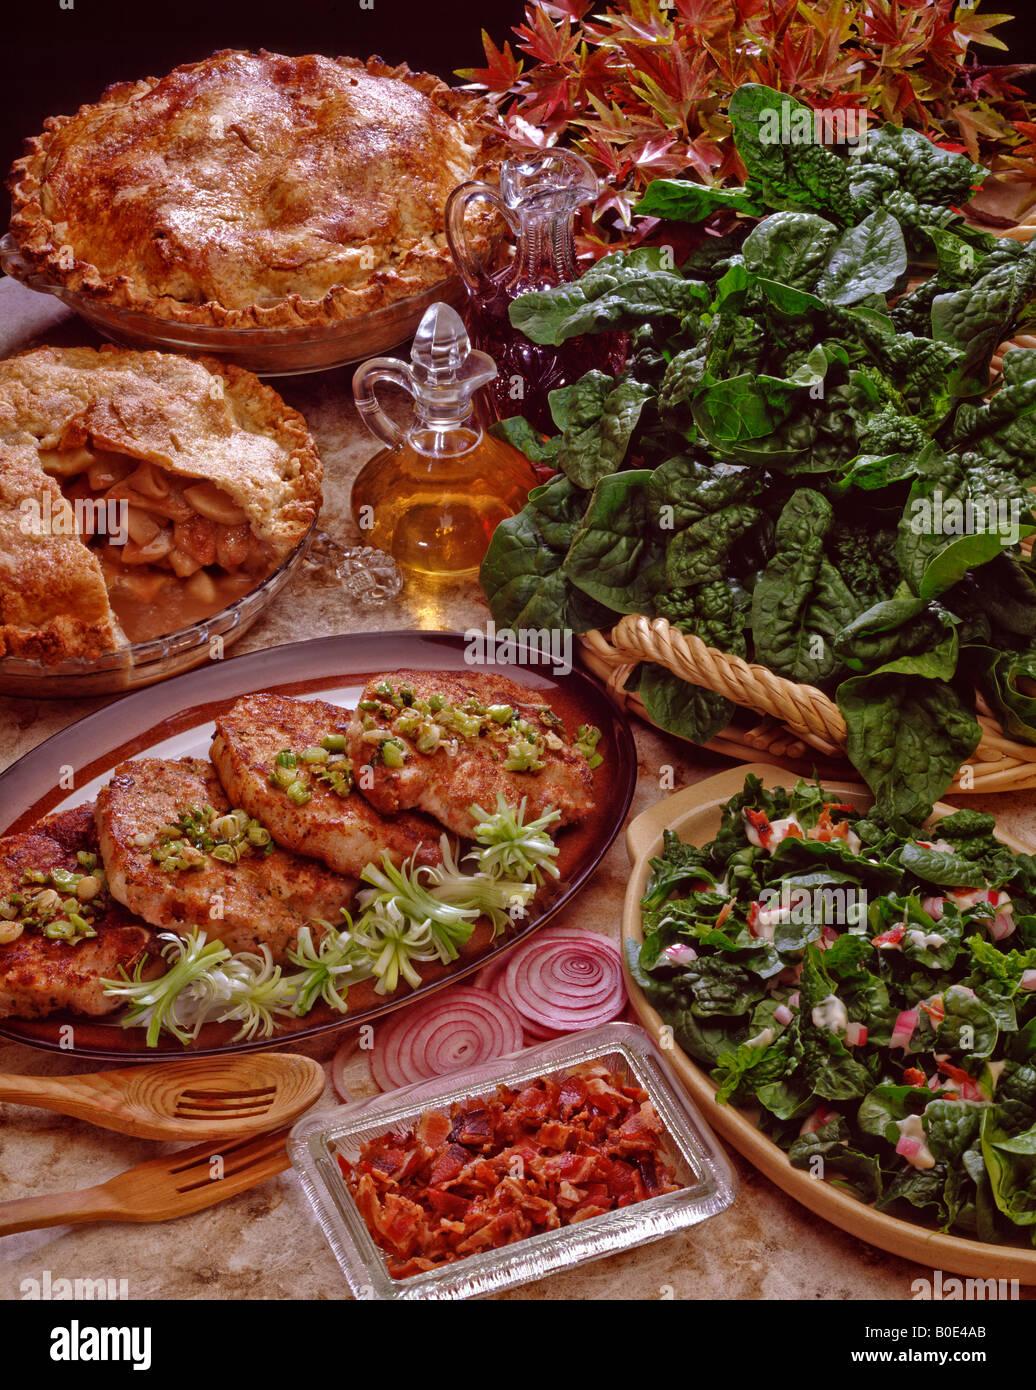 Country Kitchen Recipe Spinach Salad Pork Chops Parmesan Nana S Apple Pie W Cider Pecan Crust Lunch Dessert Lettuce